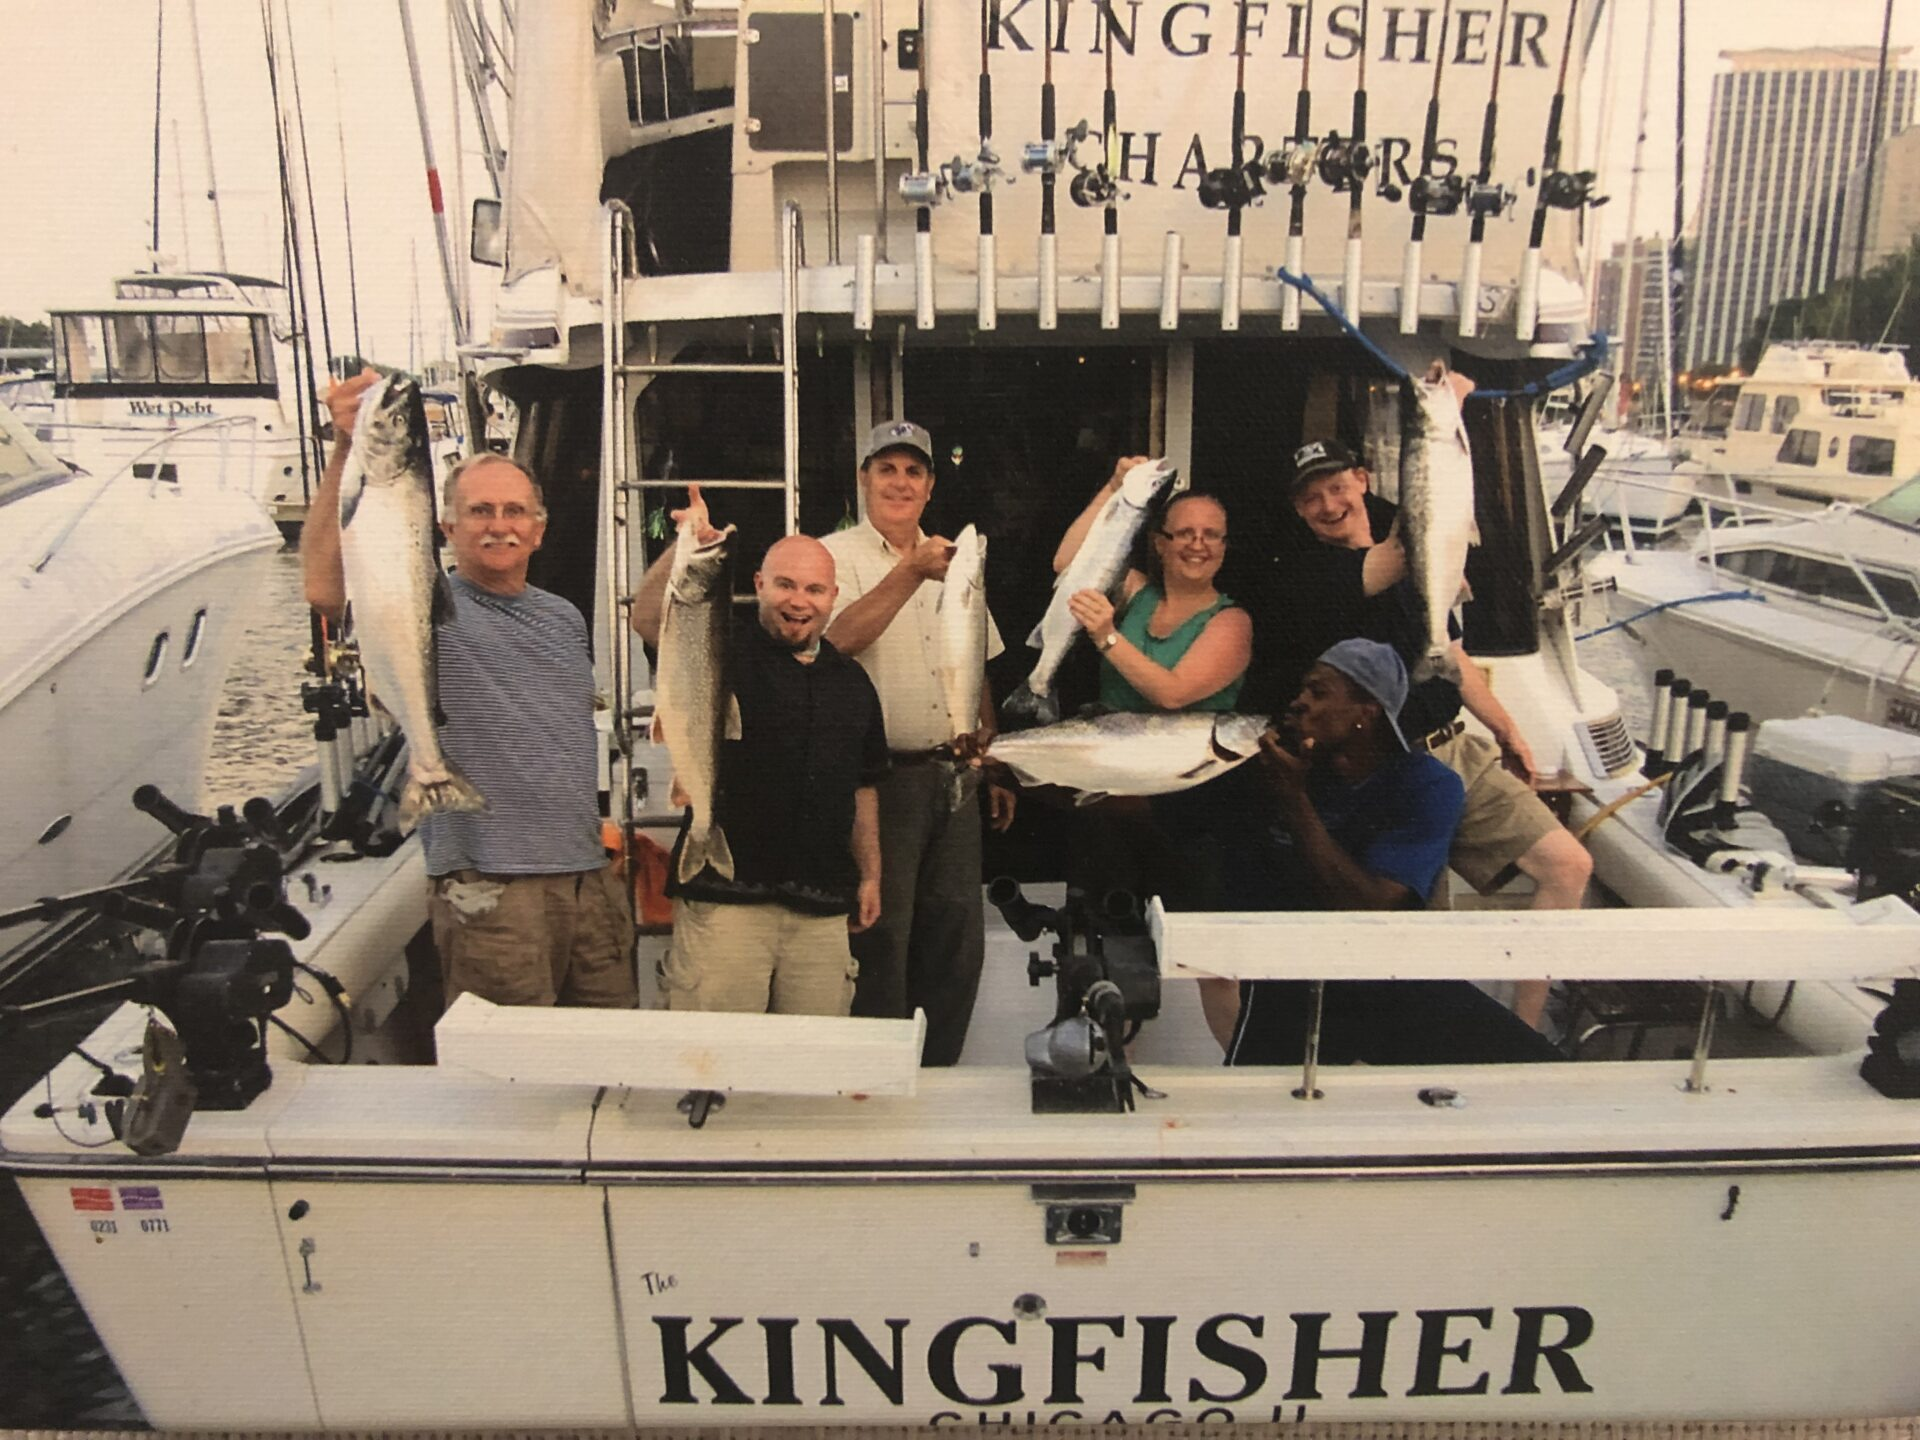 KingFisherFish_hotSpot